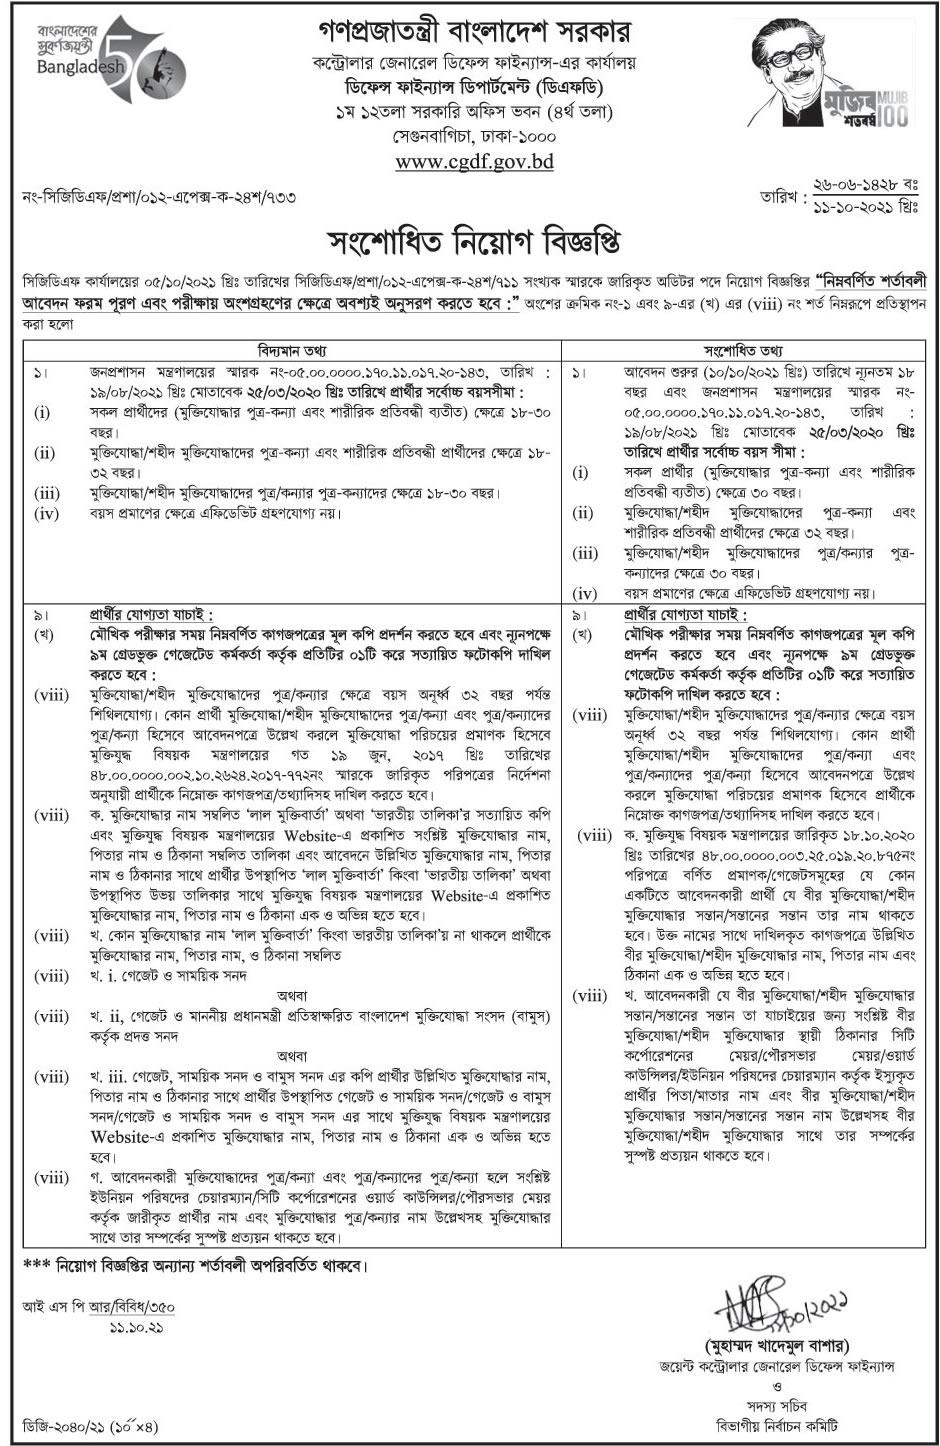 cgdf job circular notice 2021